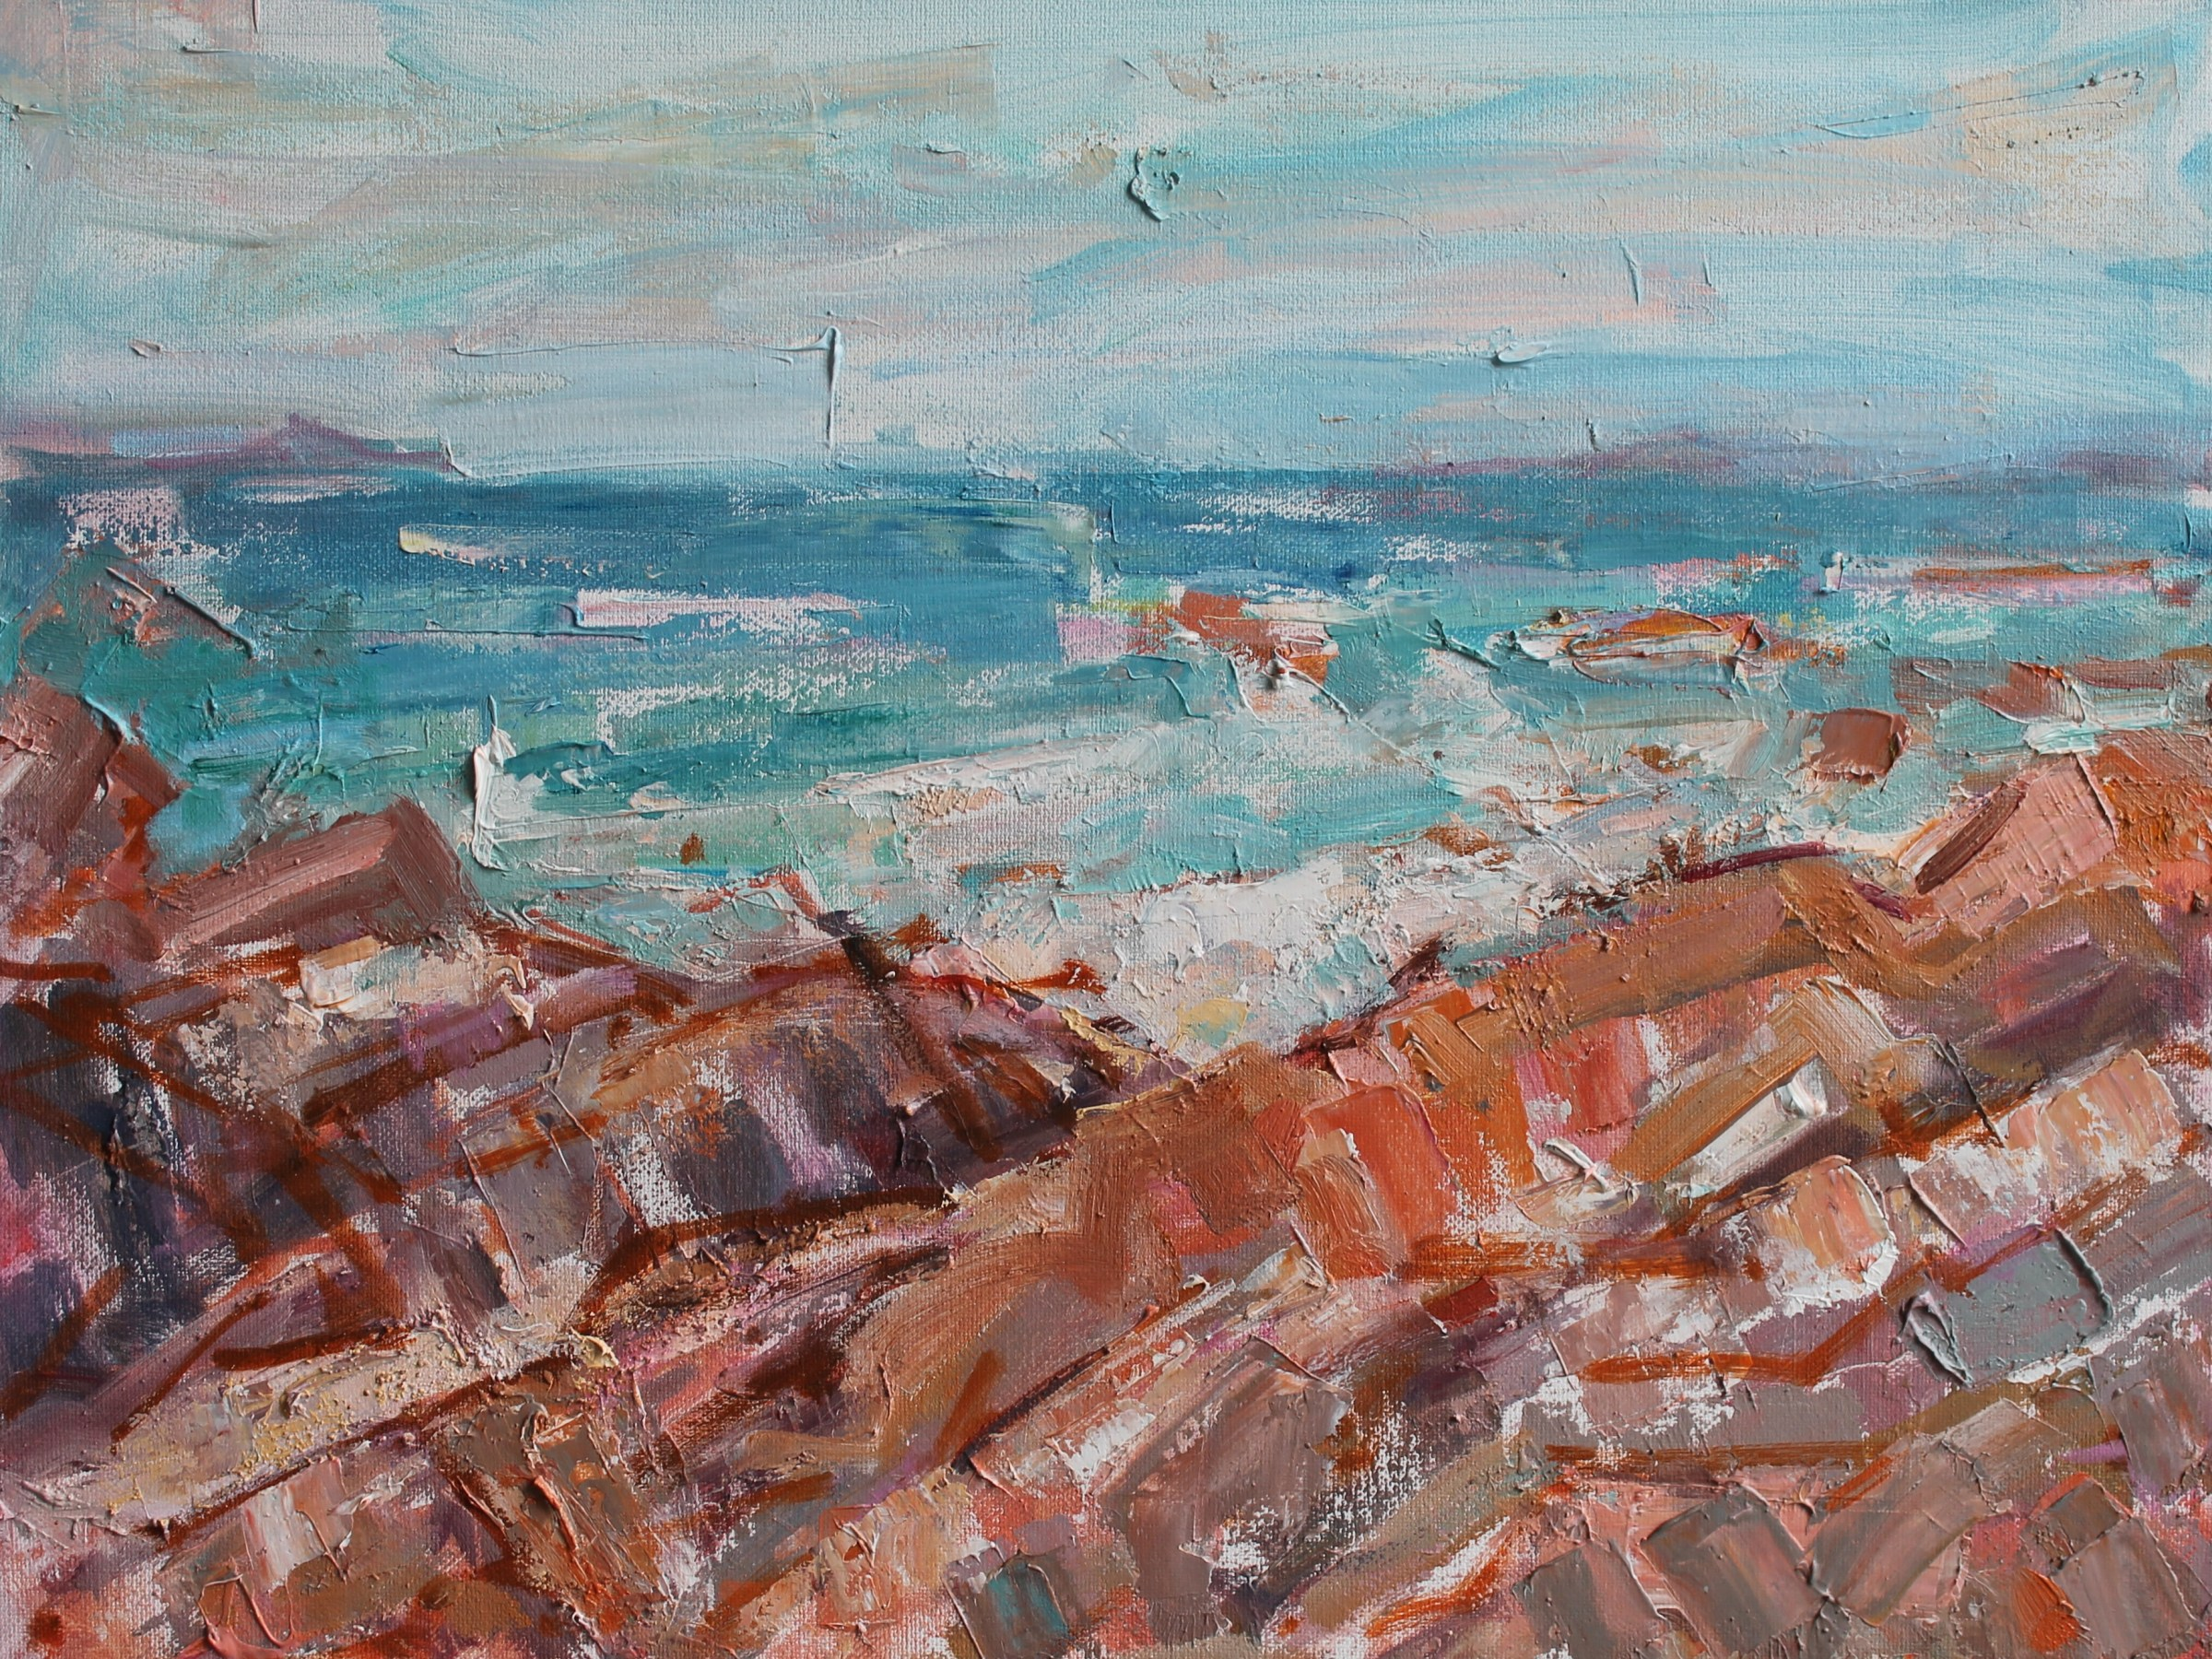 Iona Rocks. Painting by Jackie Philip